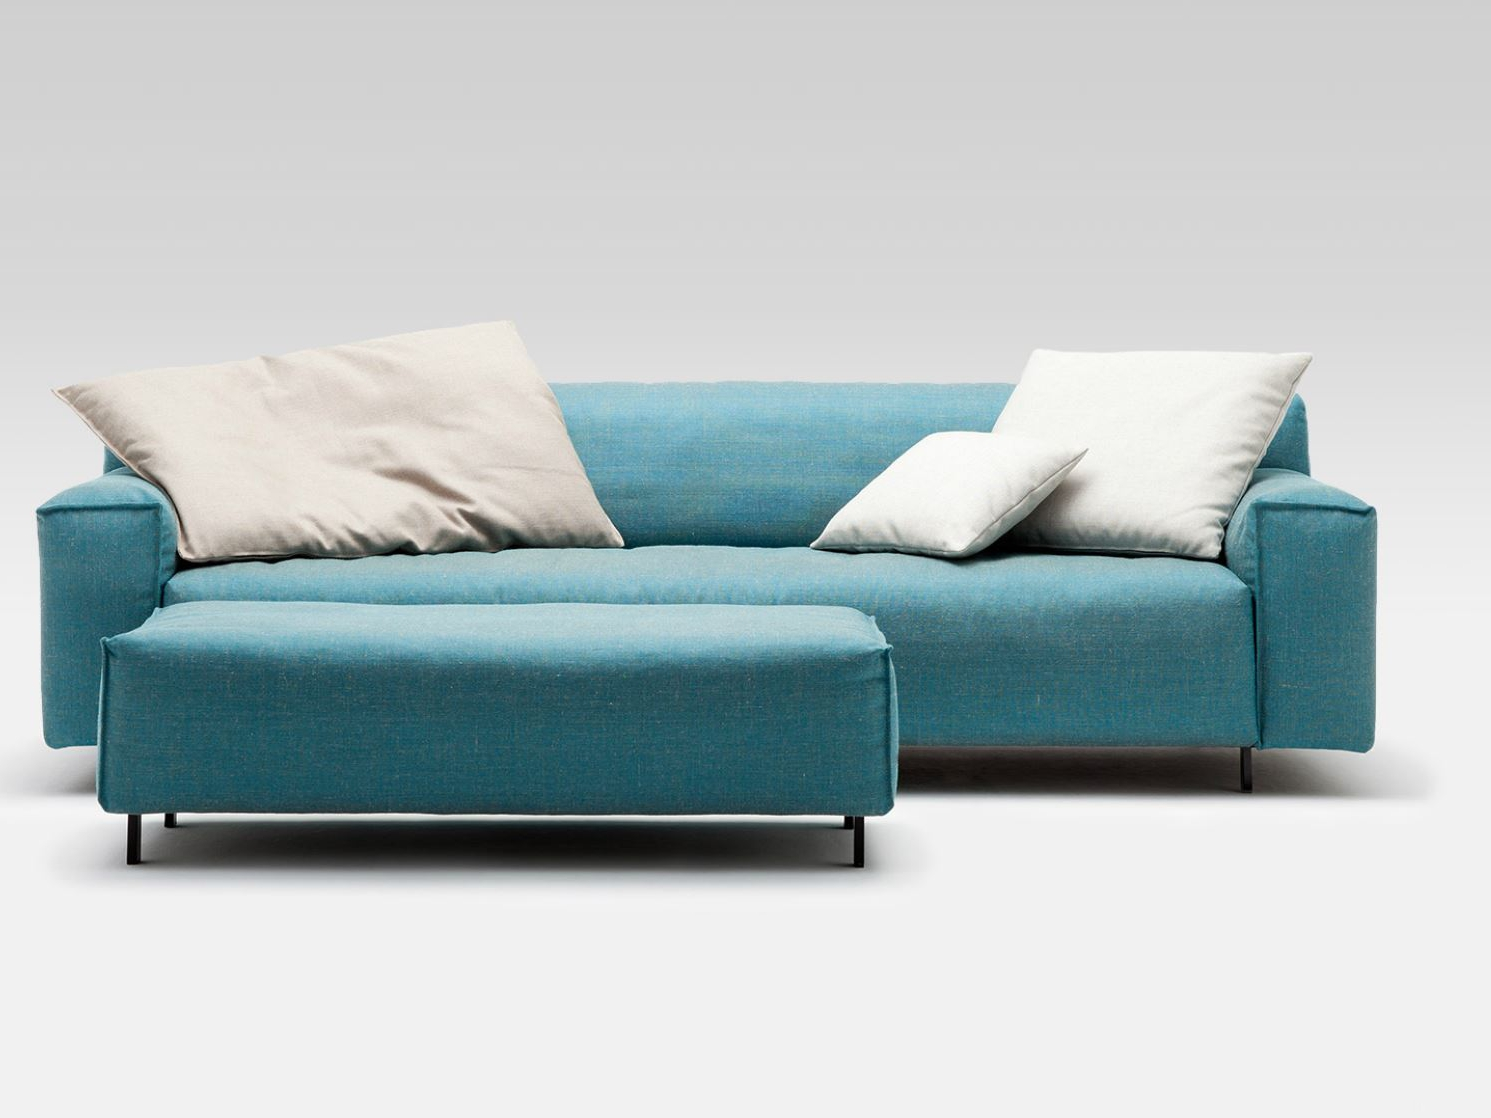 Fabric sofa GRATA by Rolf Benz design Christian Werner